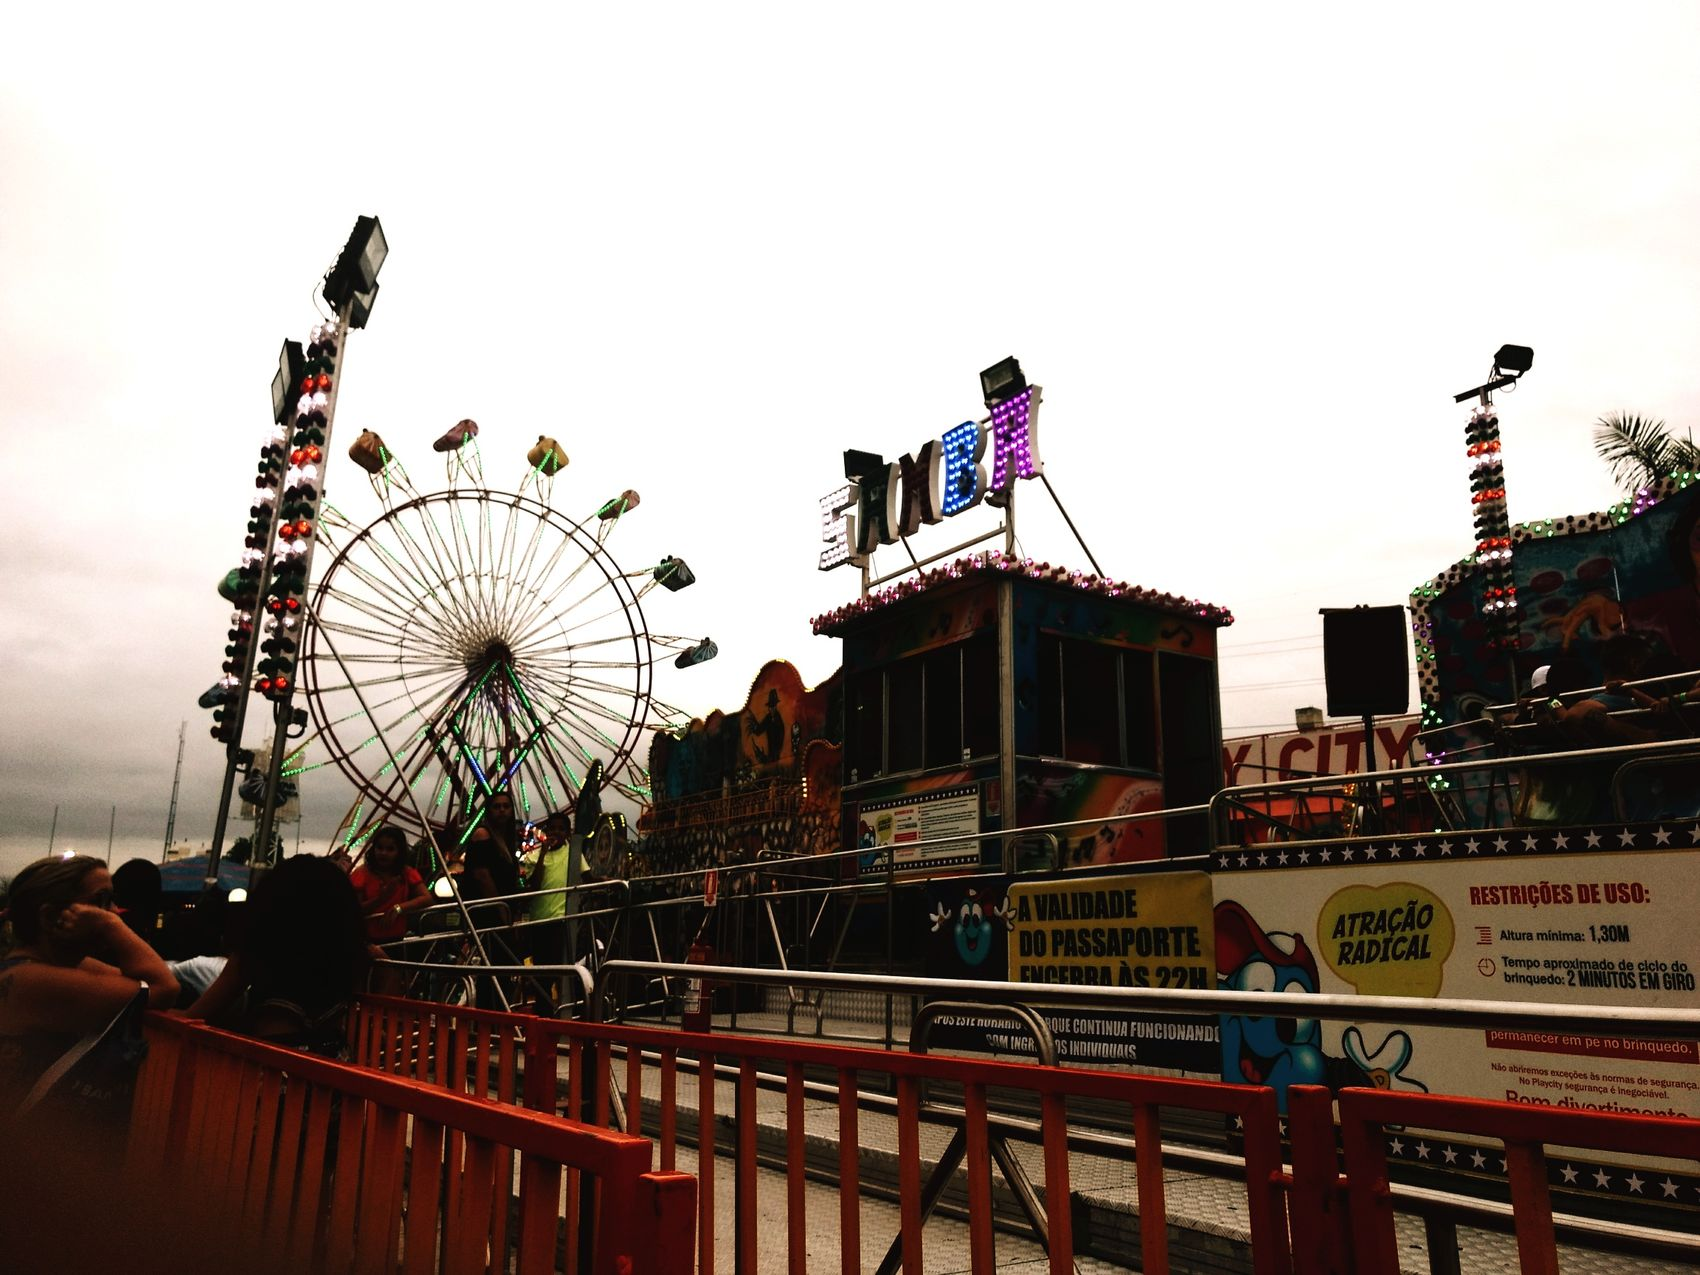 Samba La Bamba Park Happy Place Happy Fun Amusement Park Arts Culture And Entertainment Ferris Wheel Amusement Park Ride Rollercoaster Travel Destinations Night